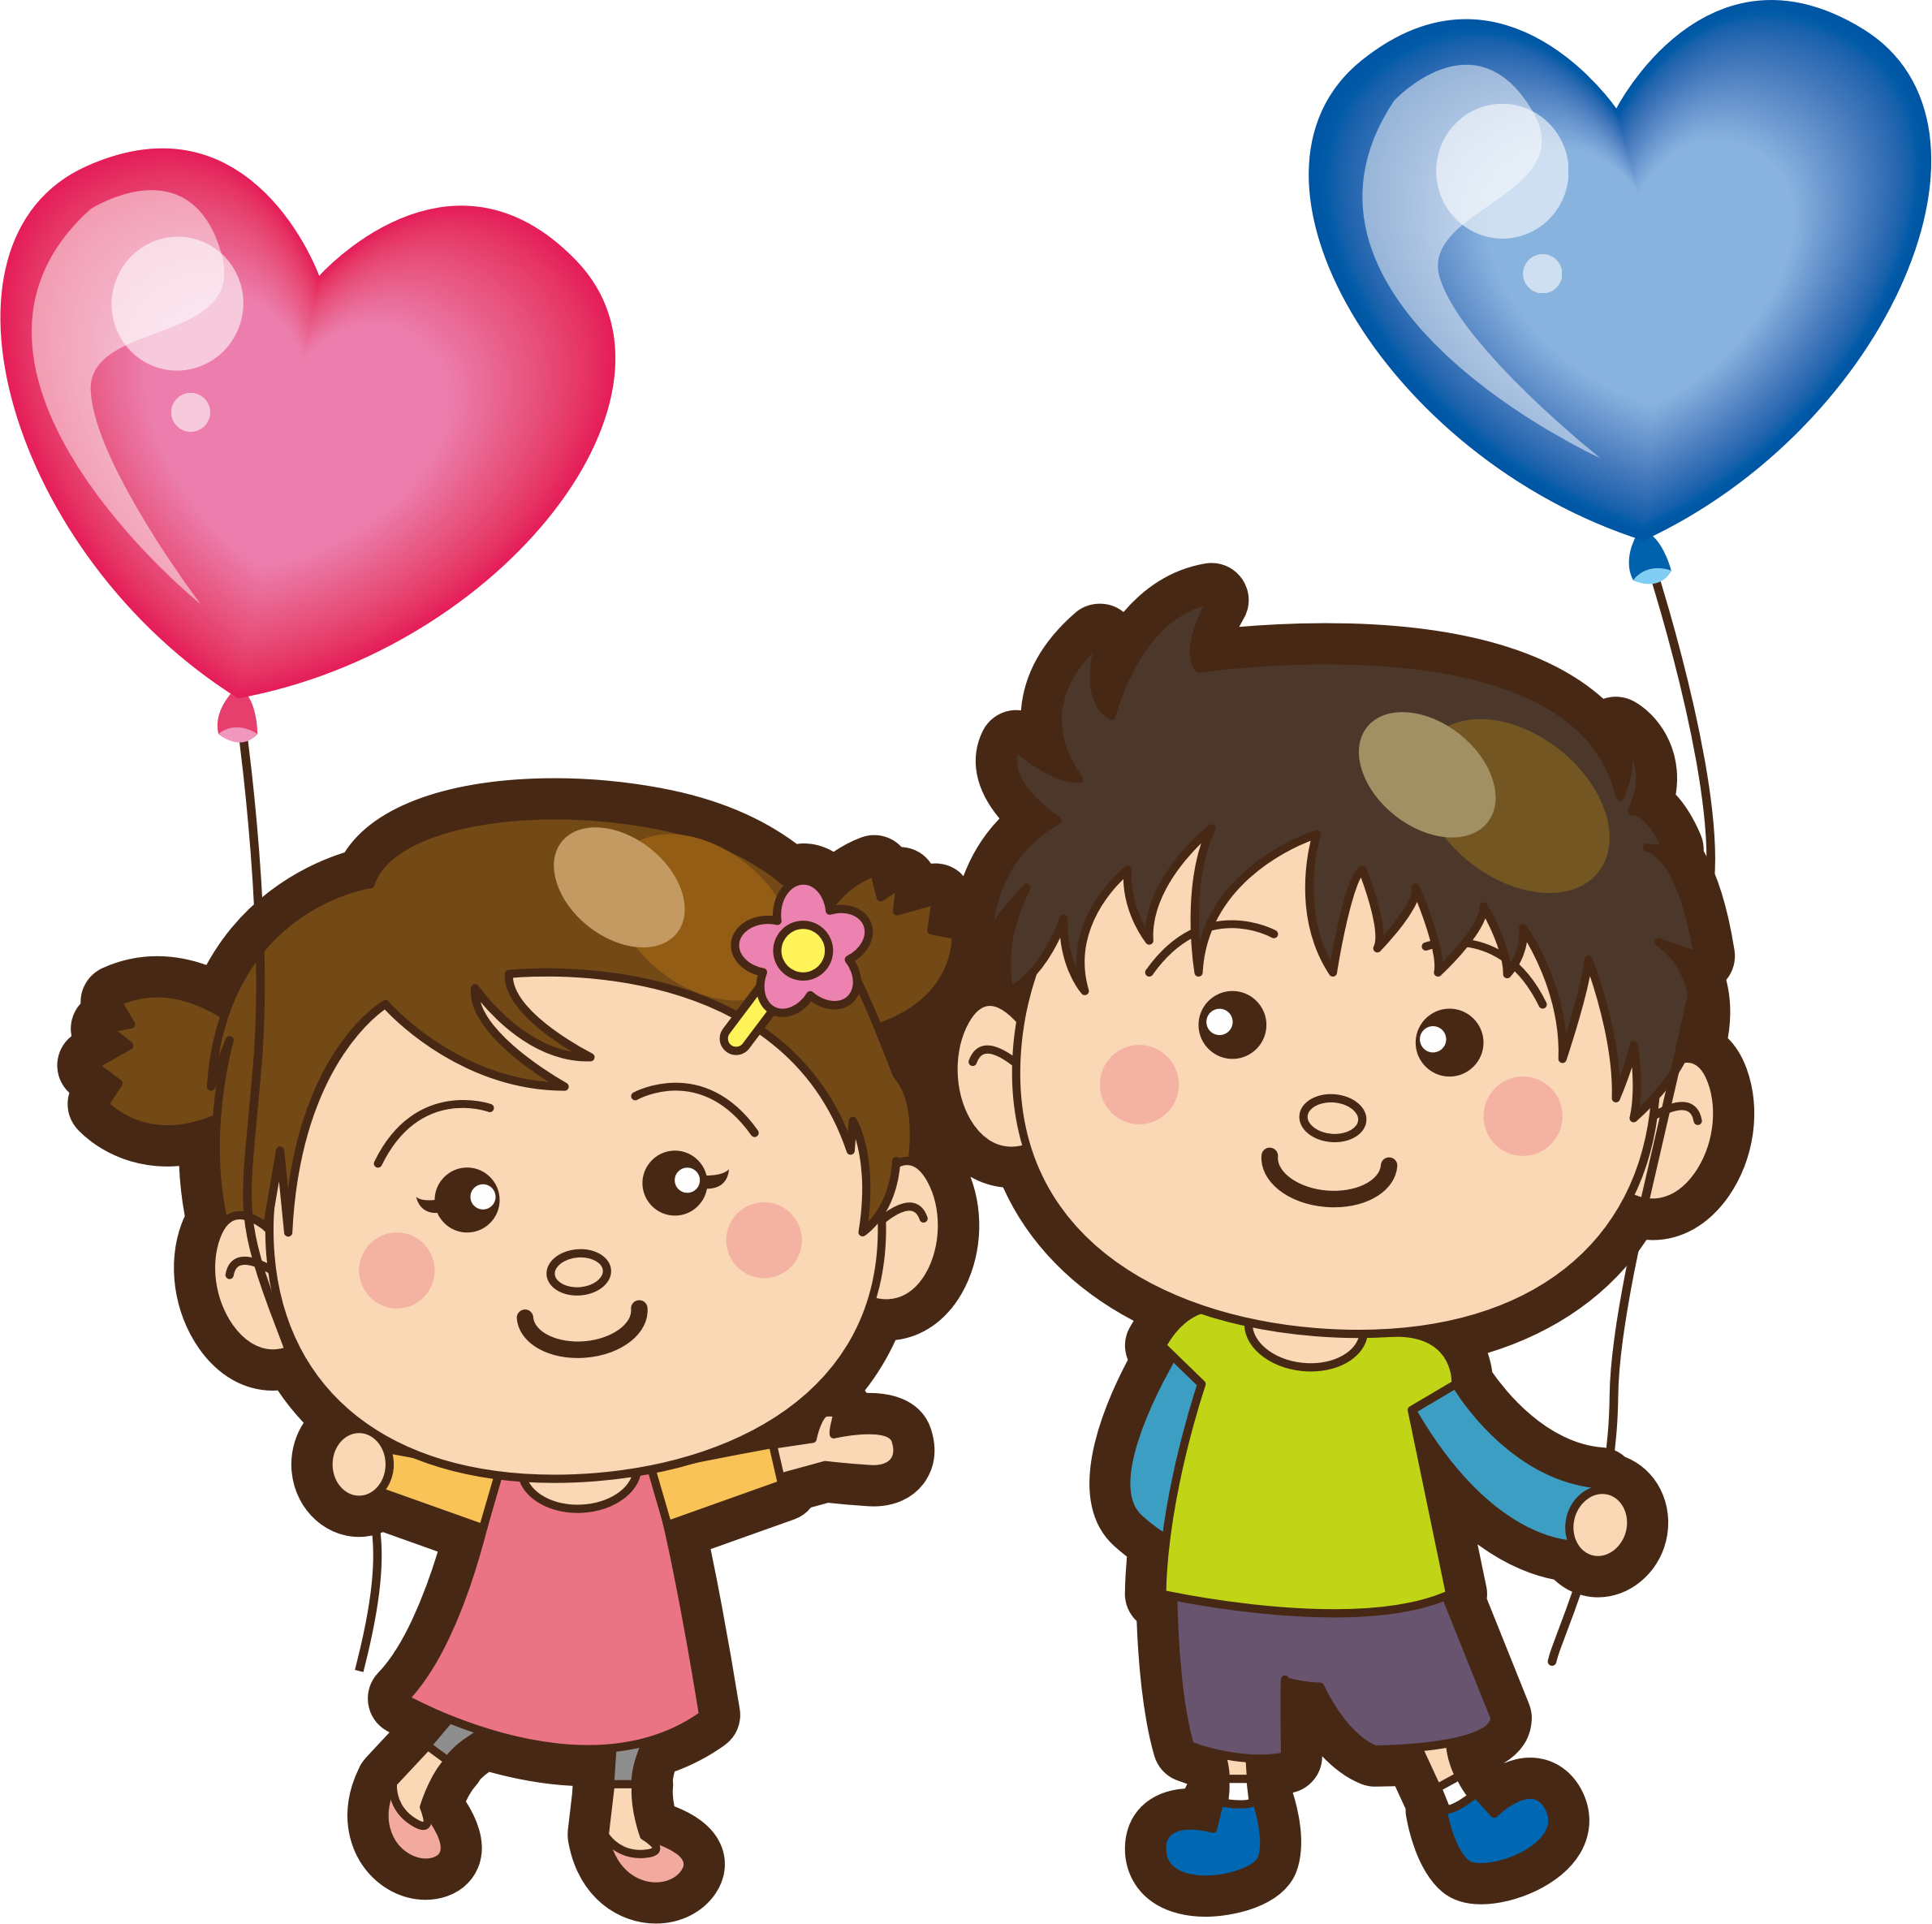 Heart shaped balloons clipart transparent Clipart - Heart-shaped Balloons transparent